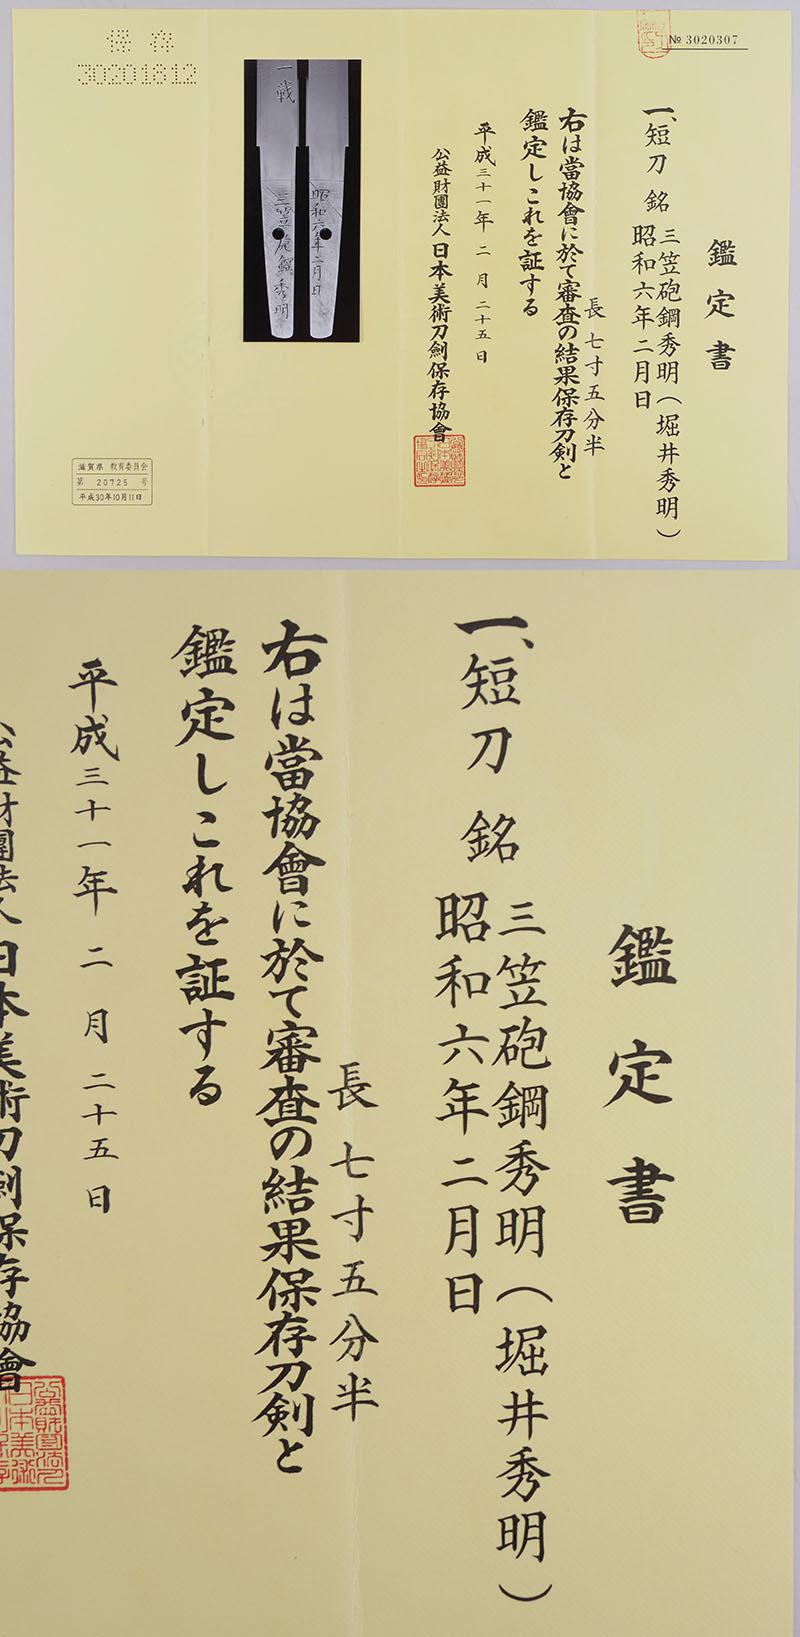 三笠砲鋼秀明(三笠刀)(堀井秀明) Picture of Certificate